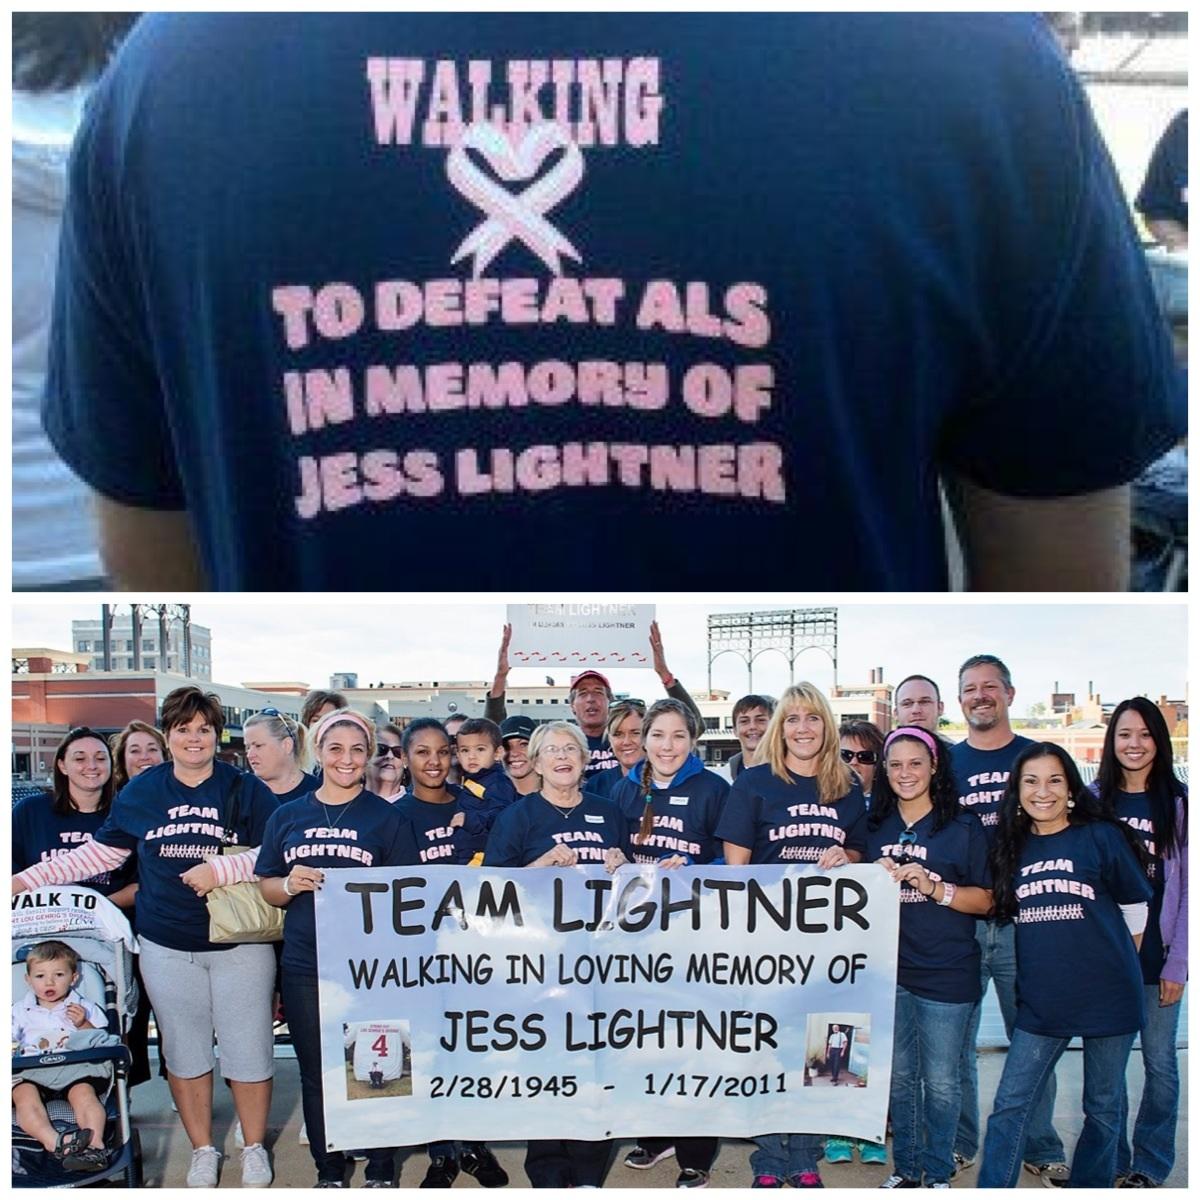 Custom T-Shirts for Team Lightner Walk To Defeat Als - Shirt ...